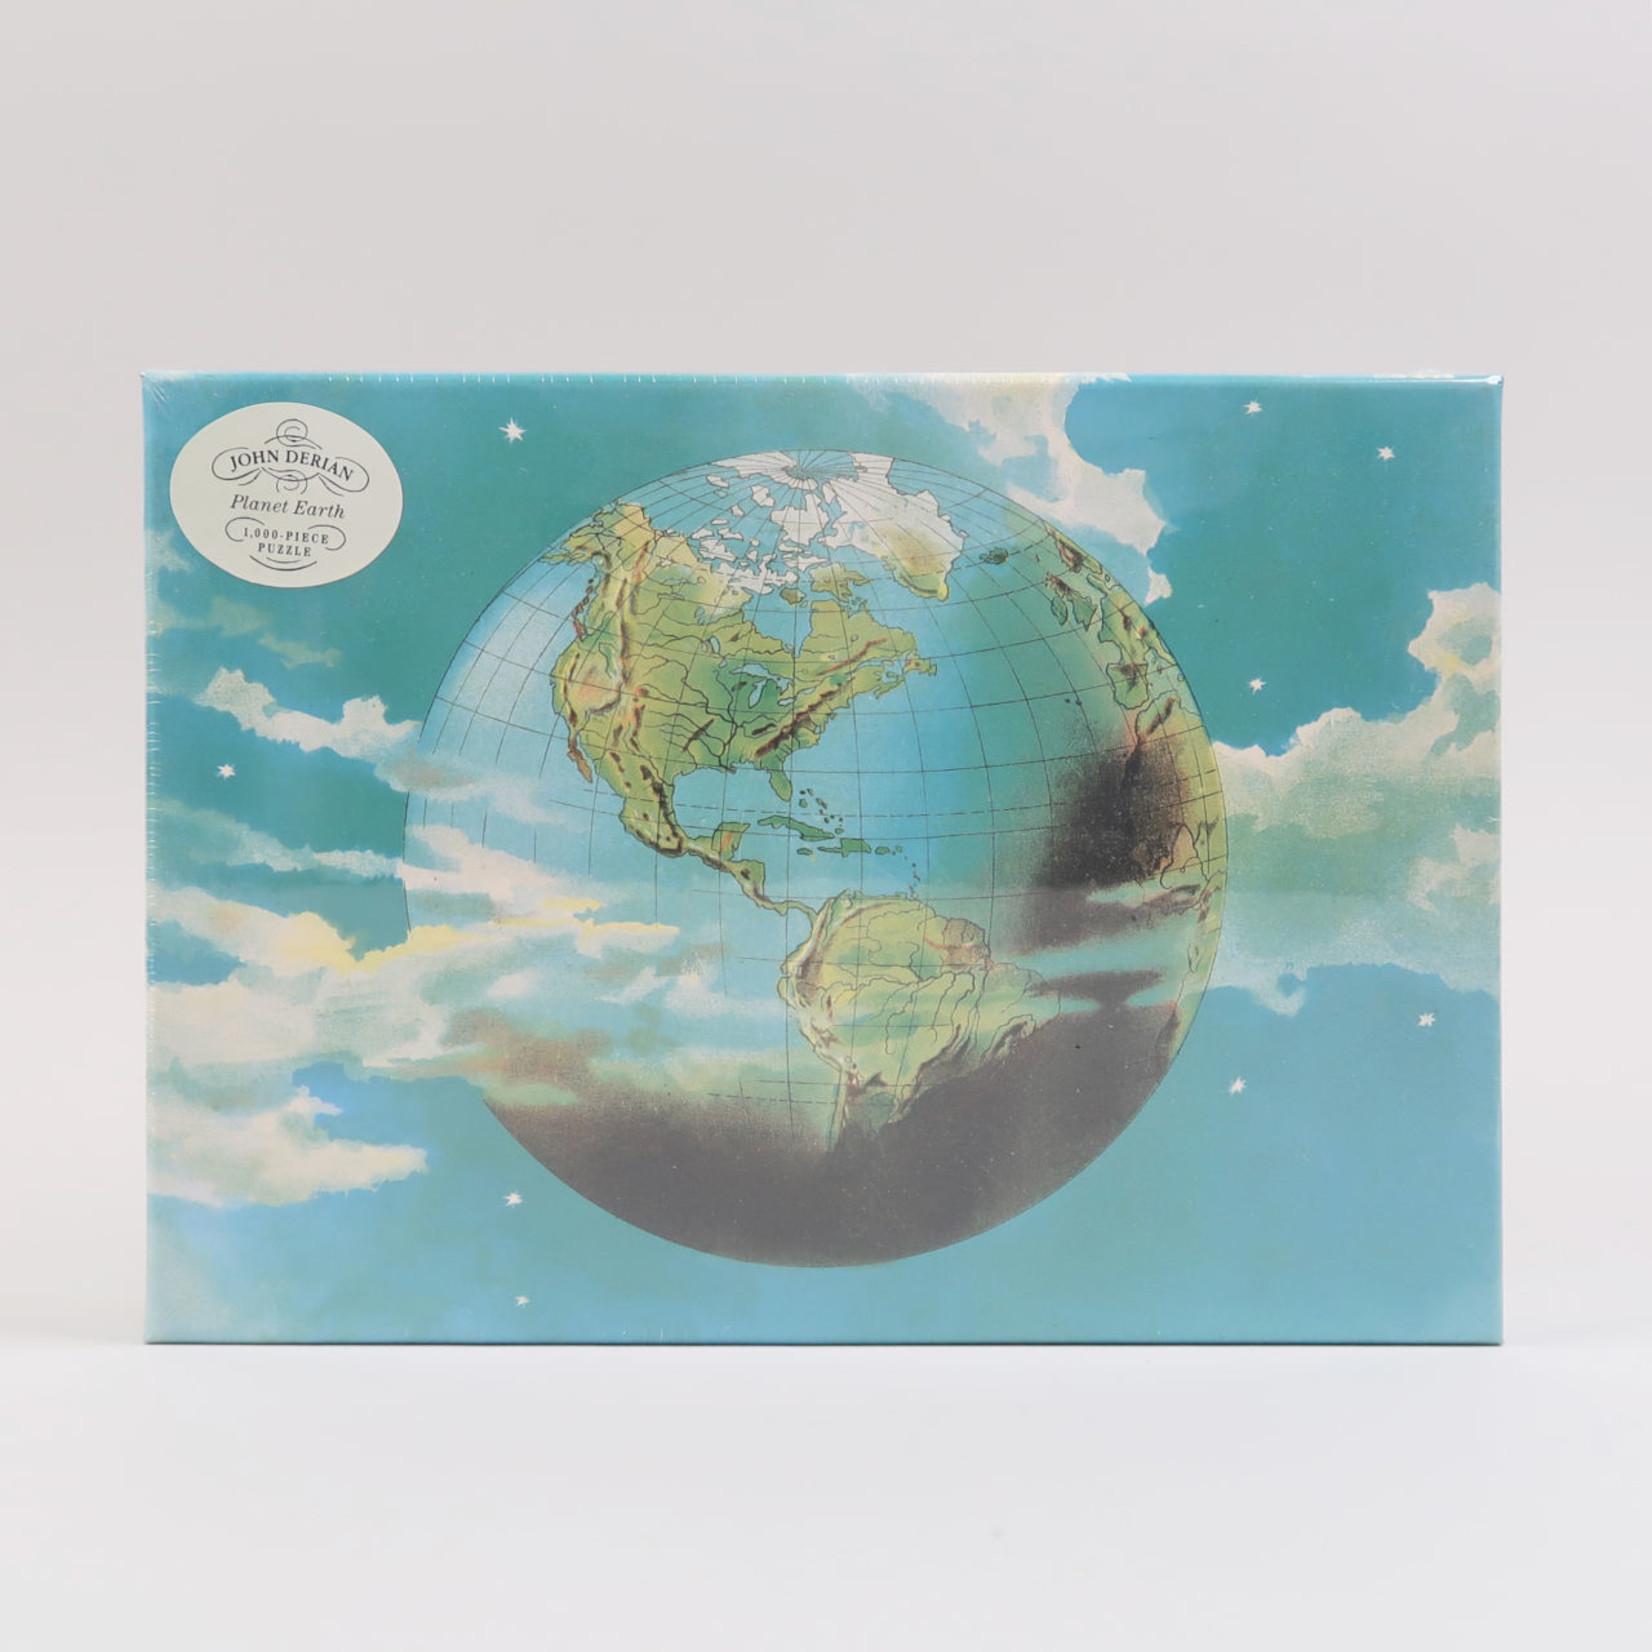 John Derian Puzzle Planet Earth